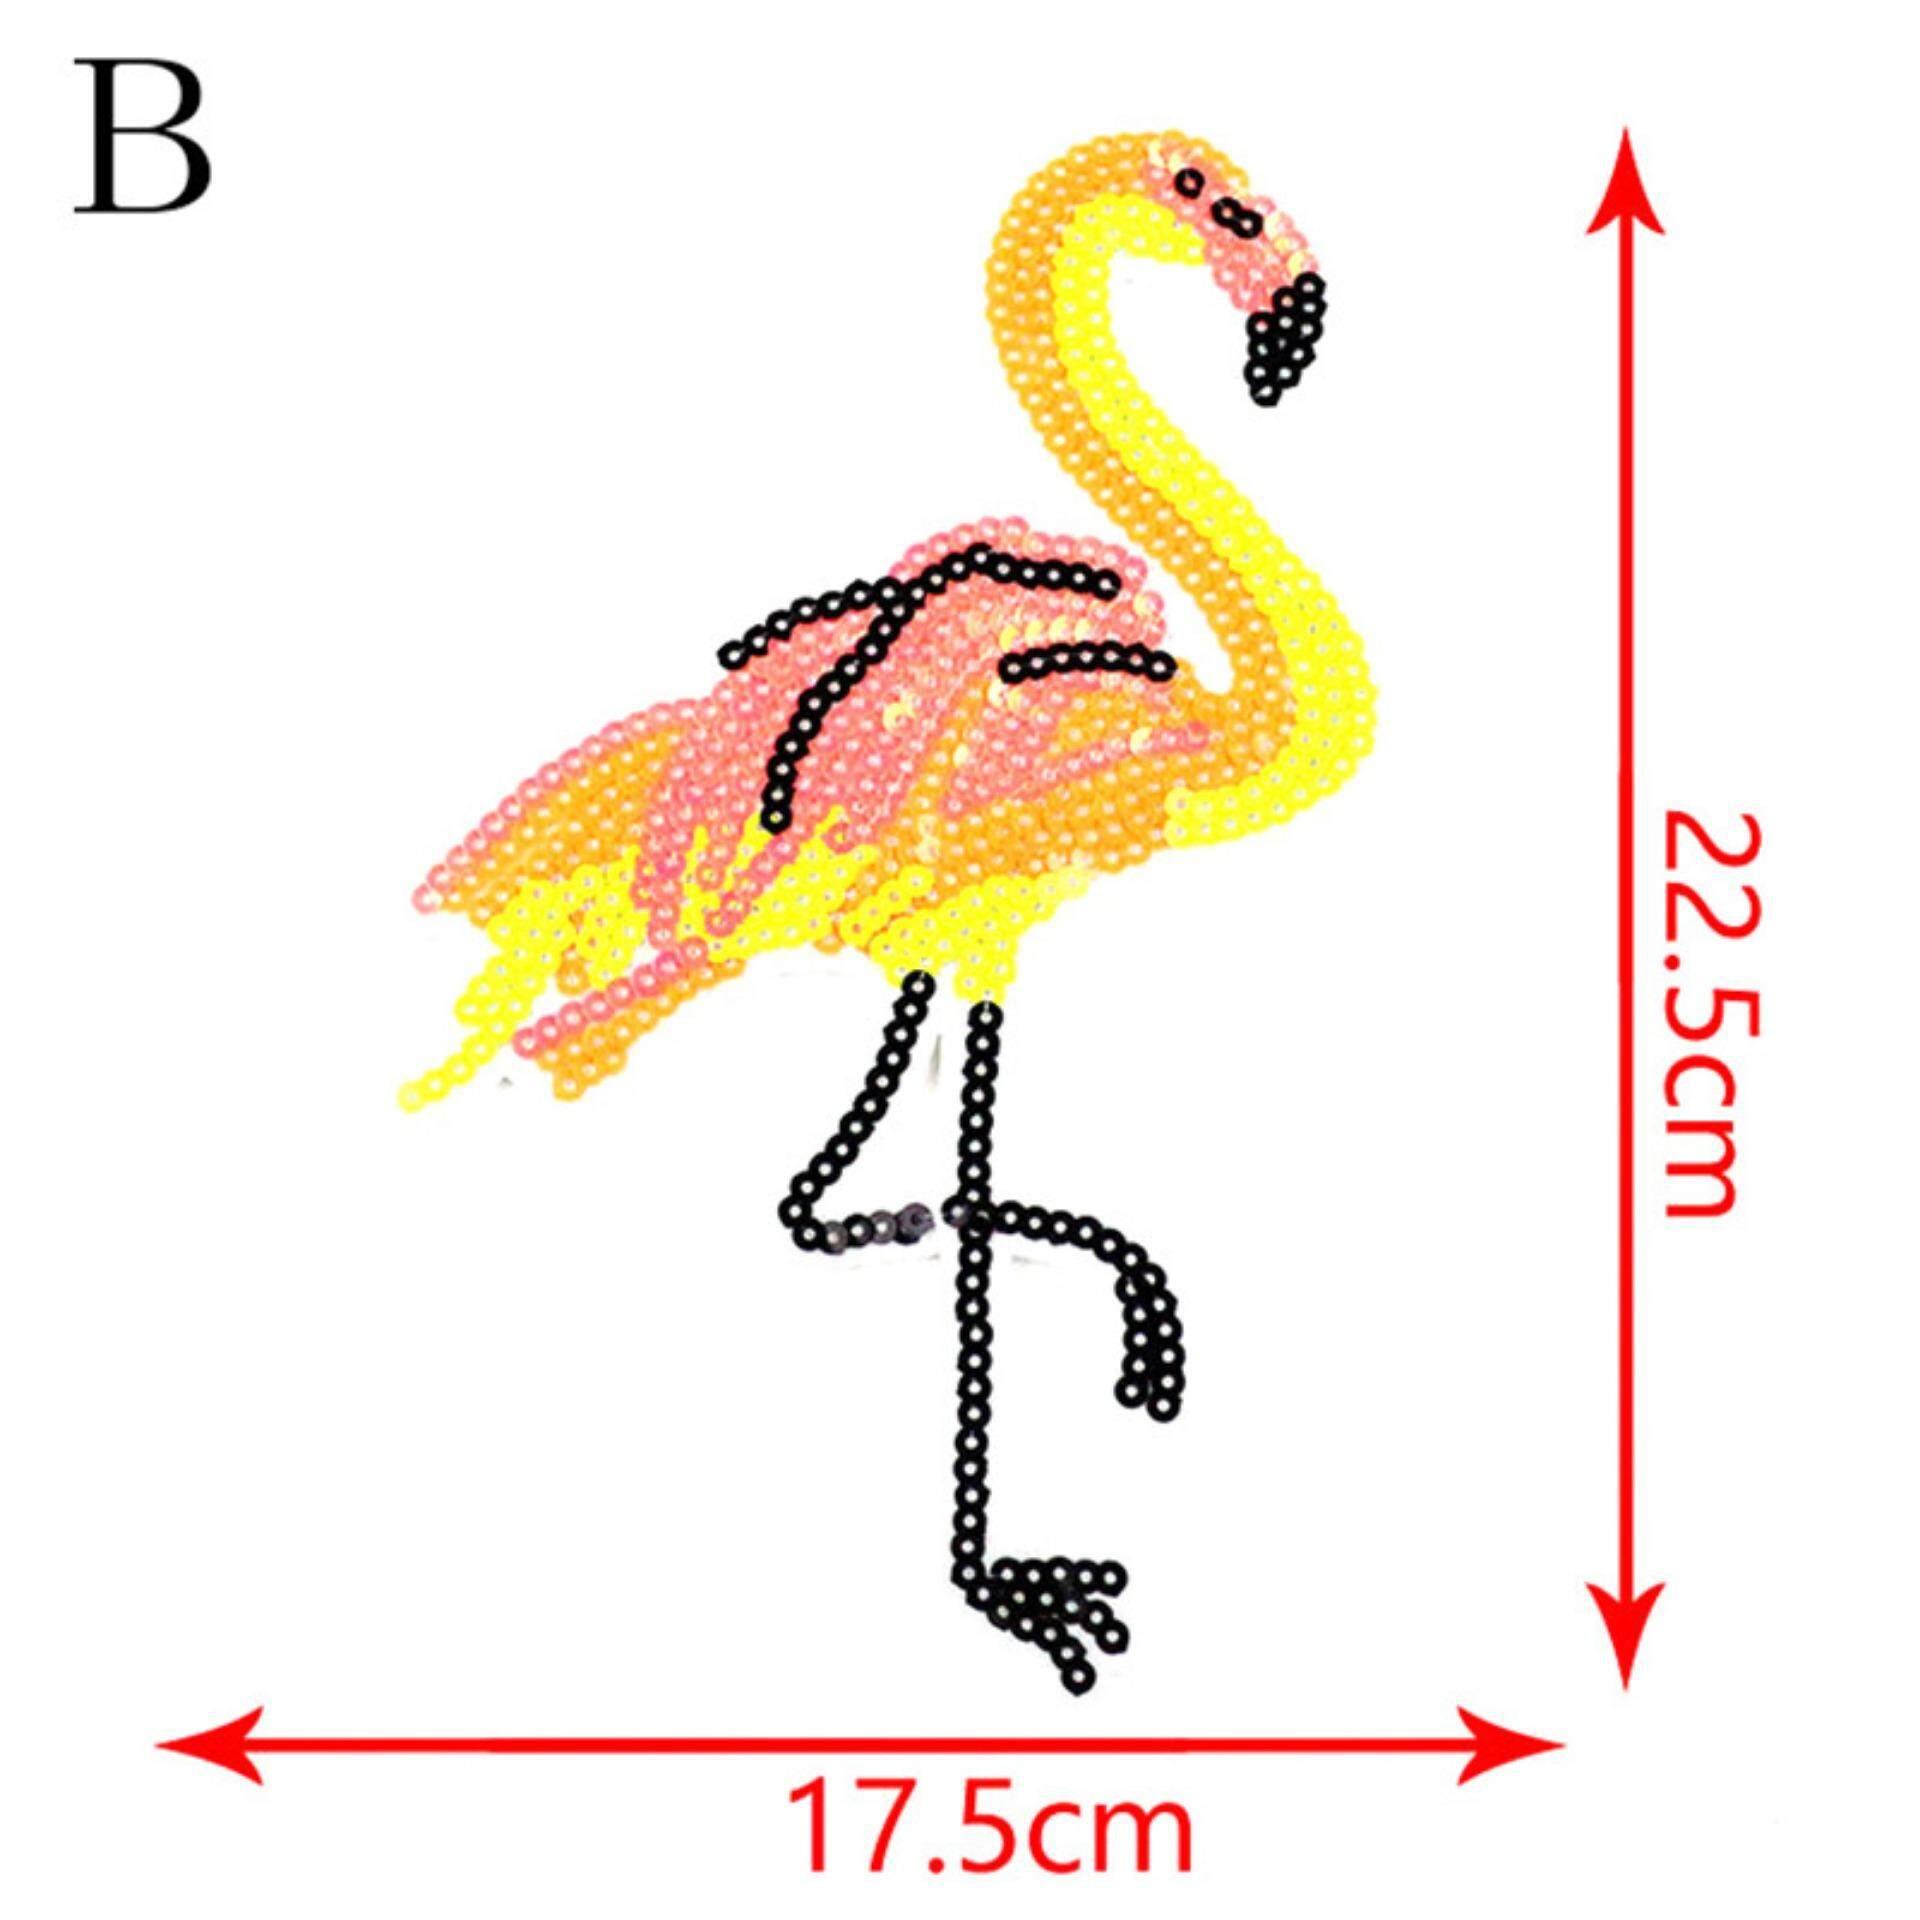 ... Blus Pesta Source · Sweater T shirt Paillette Aplikasi Bordir Flamingo Payet Patch Menjahit Pada Jenis B